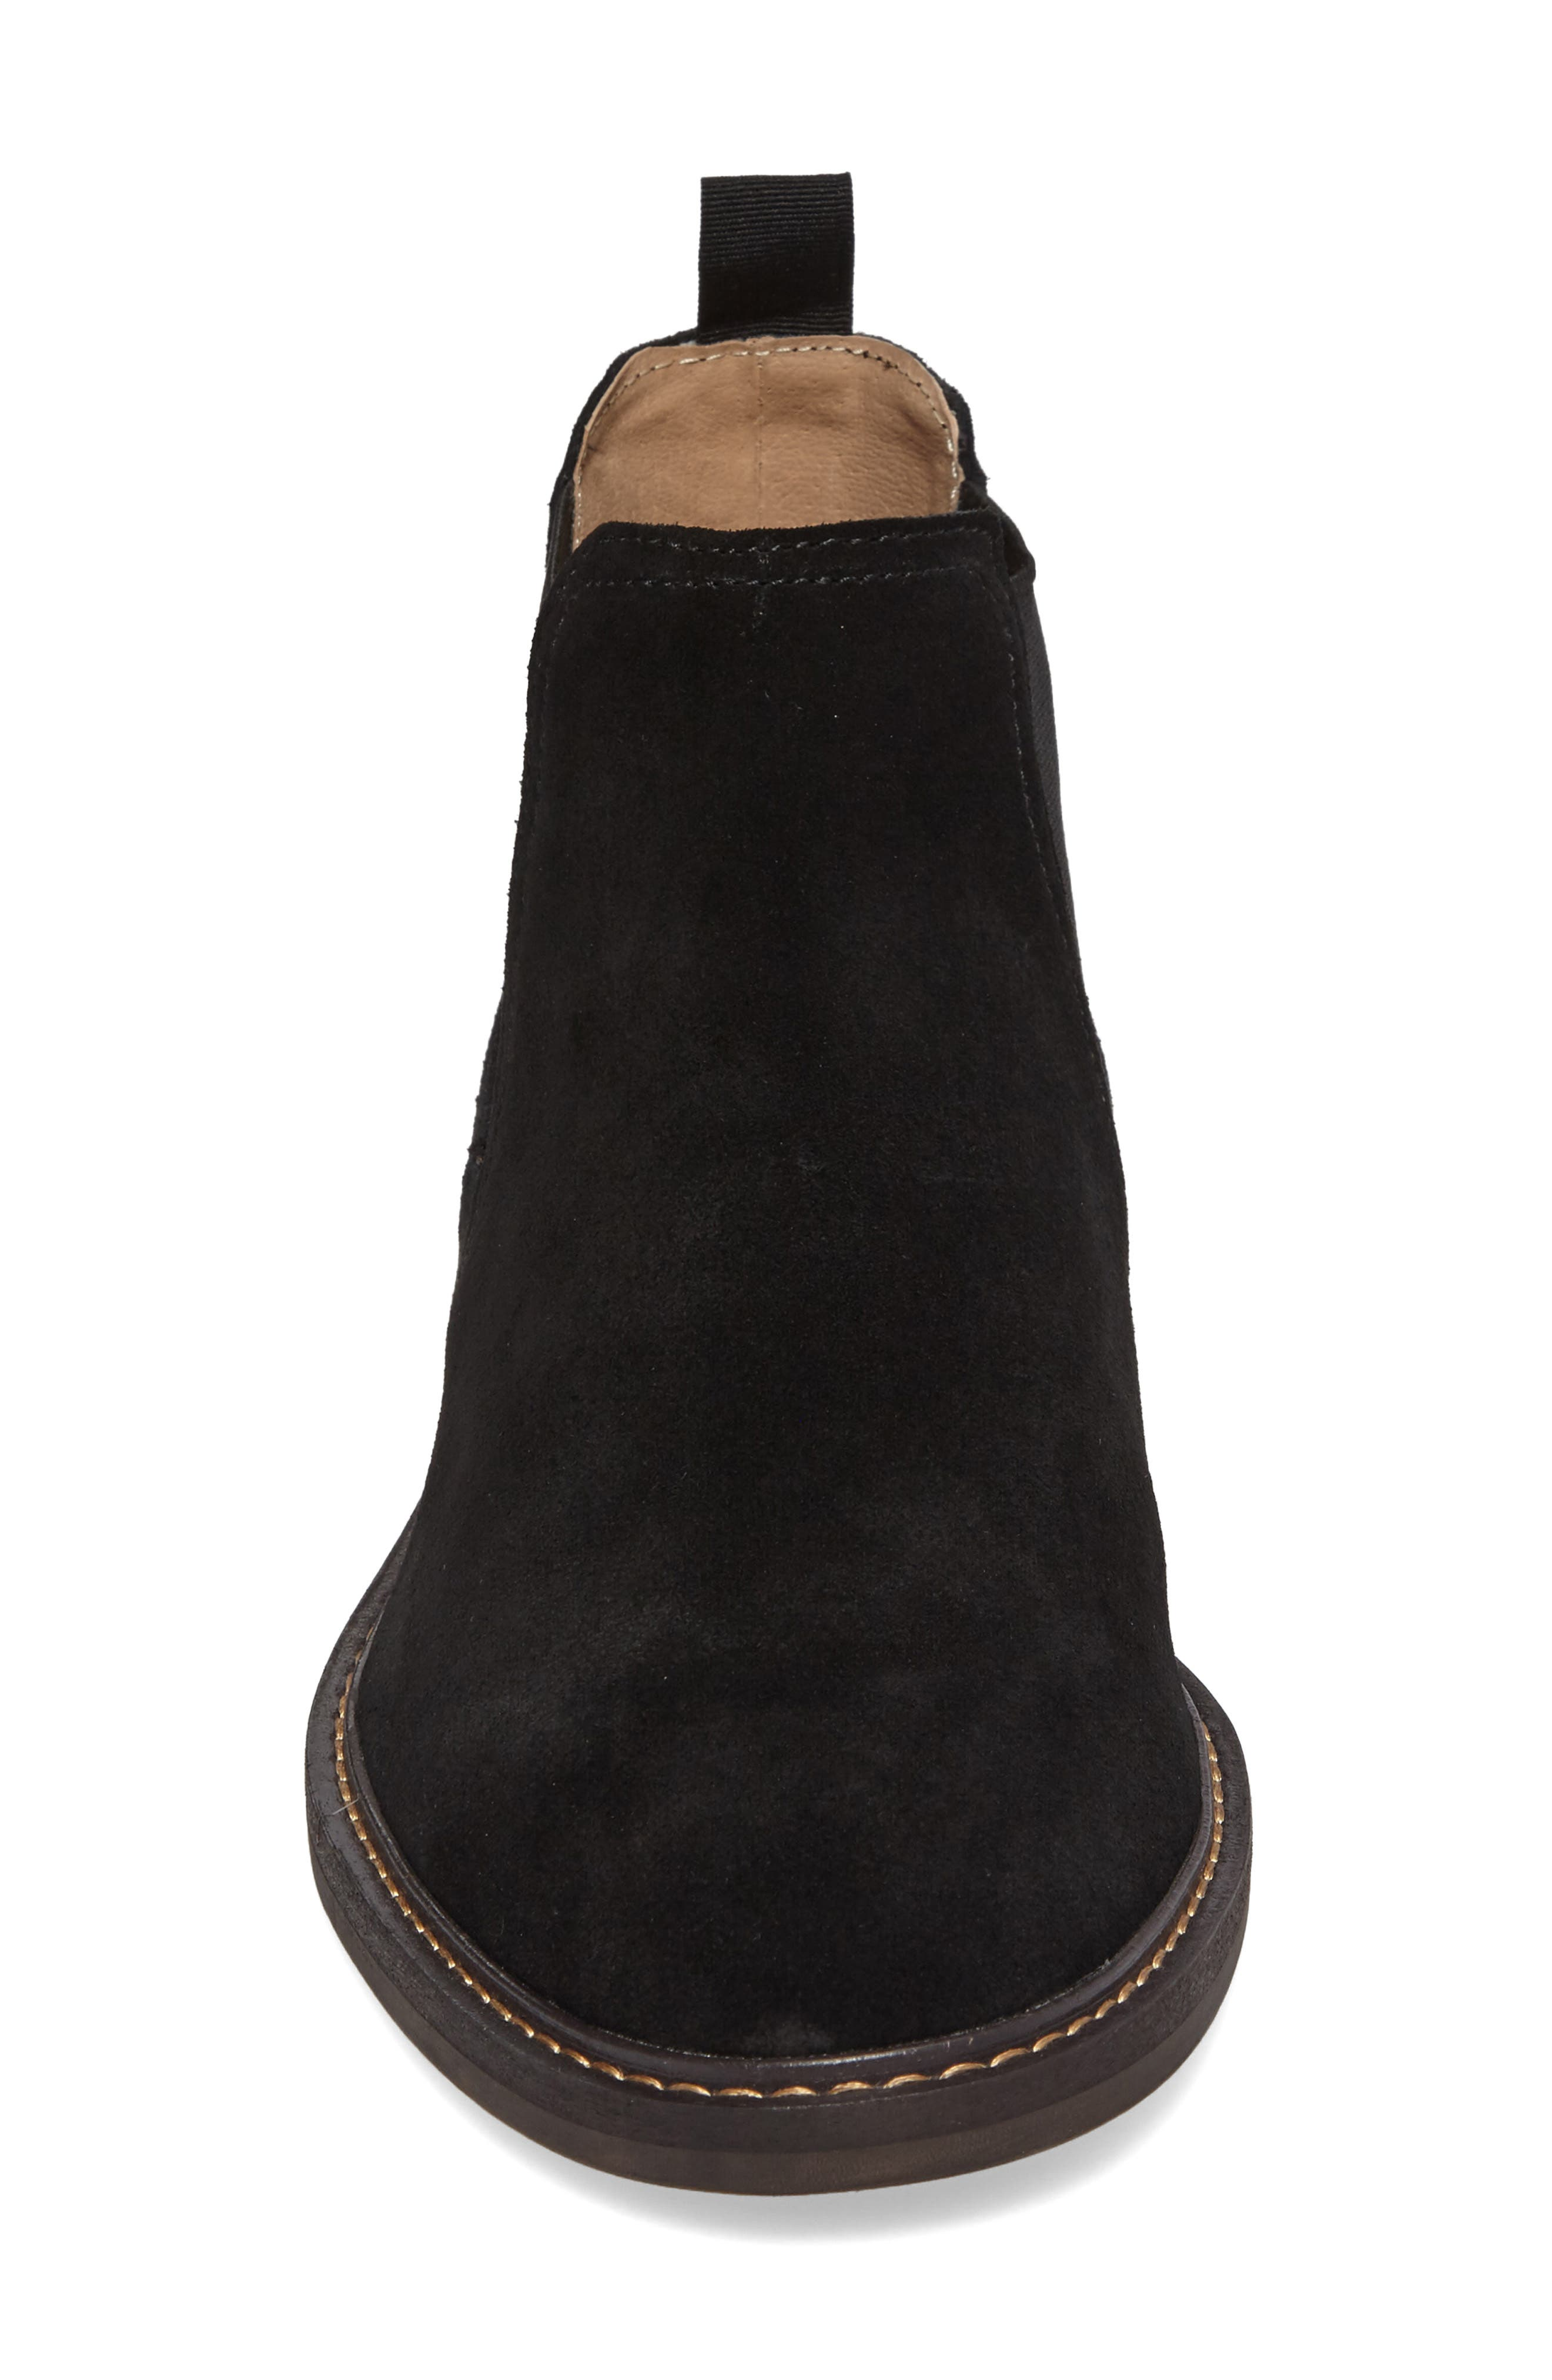 Horton Chelsea Boot,                             Alternate thumbnail 4, color,                             001